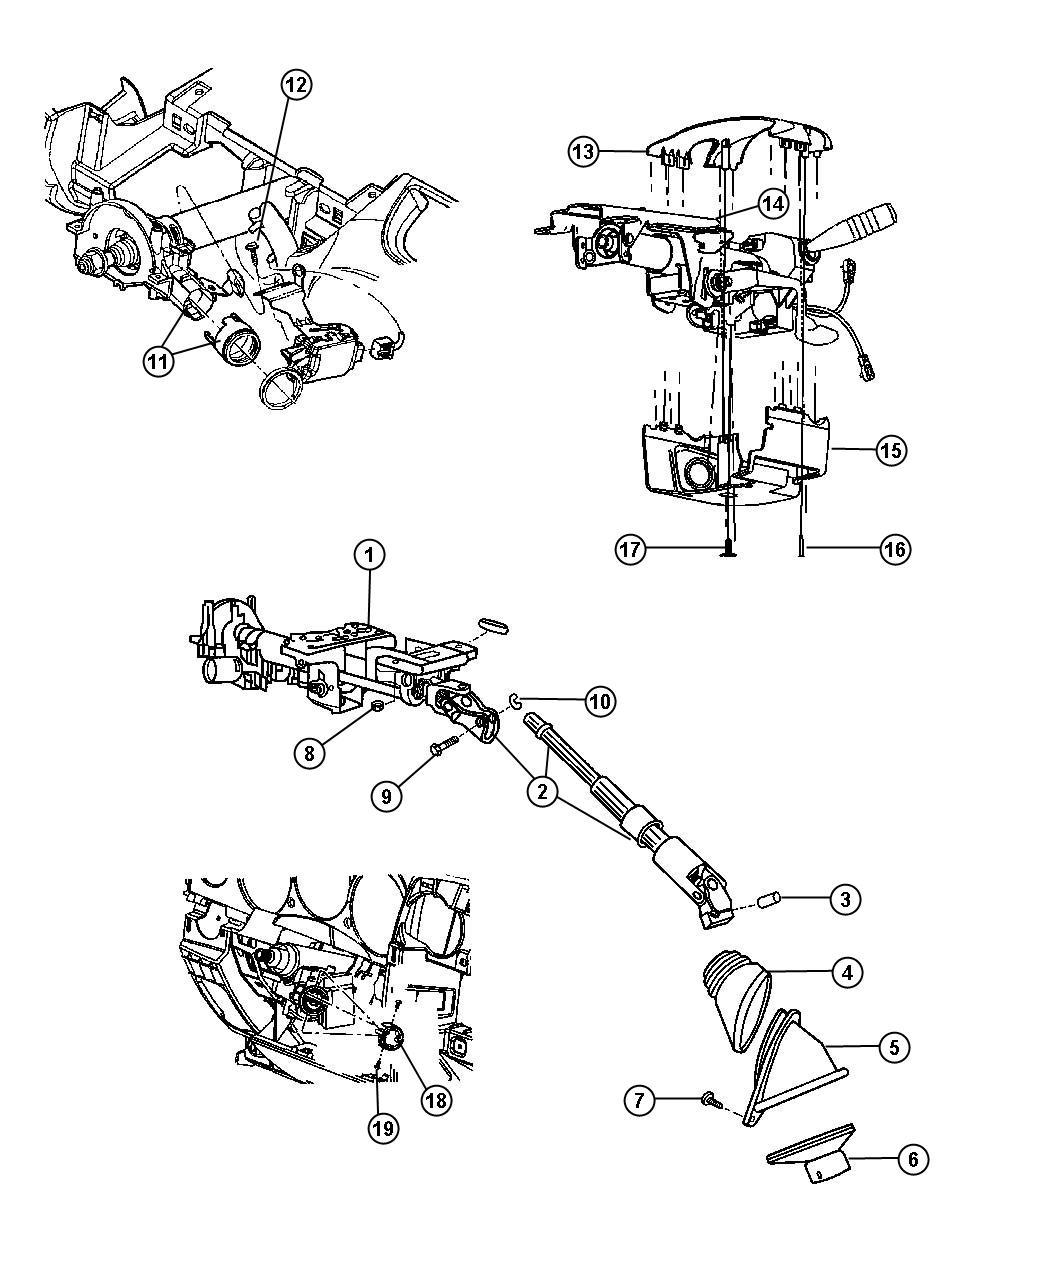 Chrysler Pt Cruiser Clip Steering Coupling Cplg